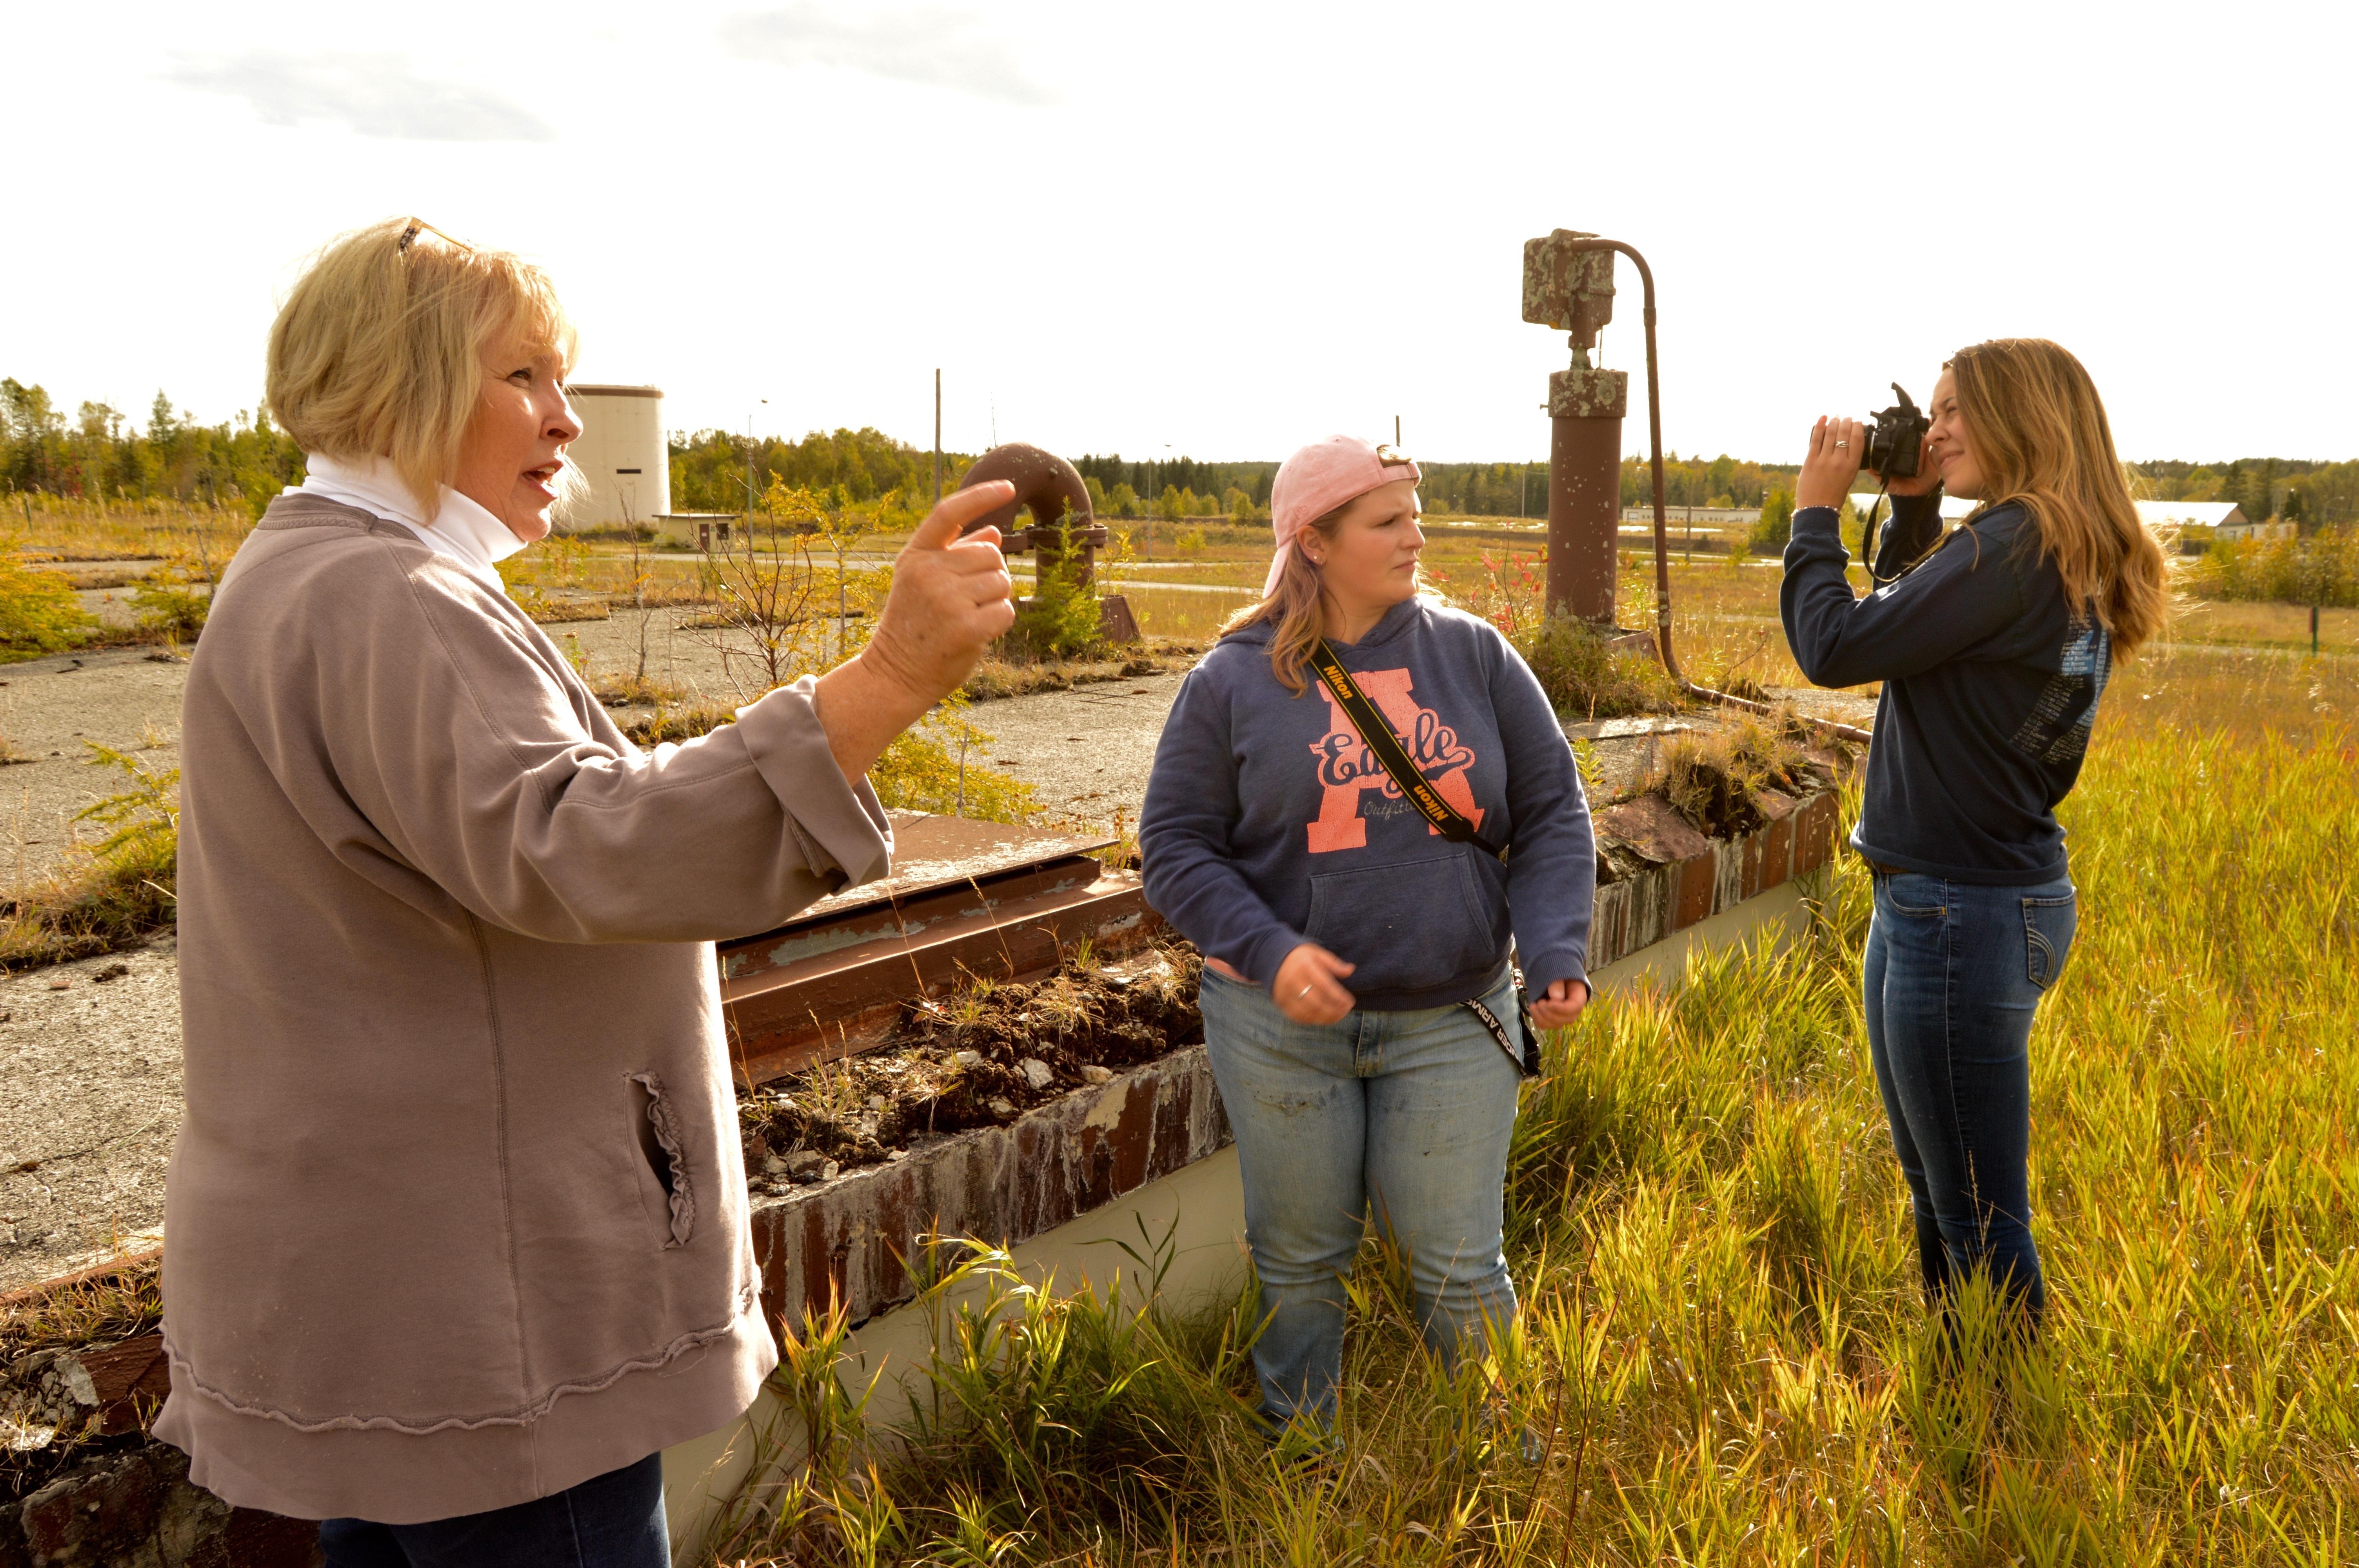 Carol Ayoob's photo class takes field trip